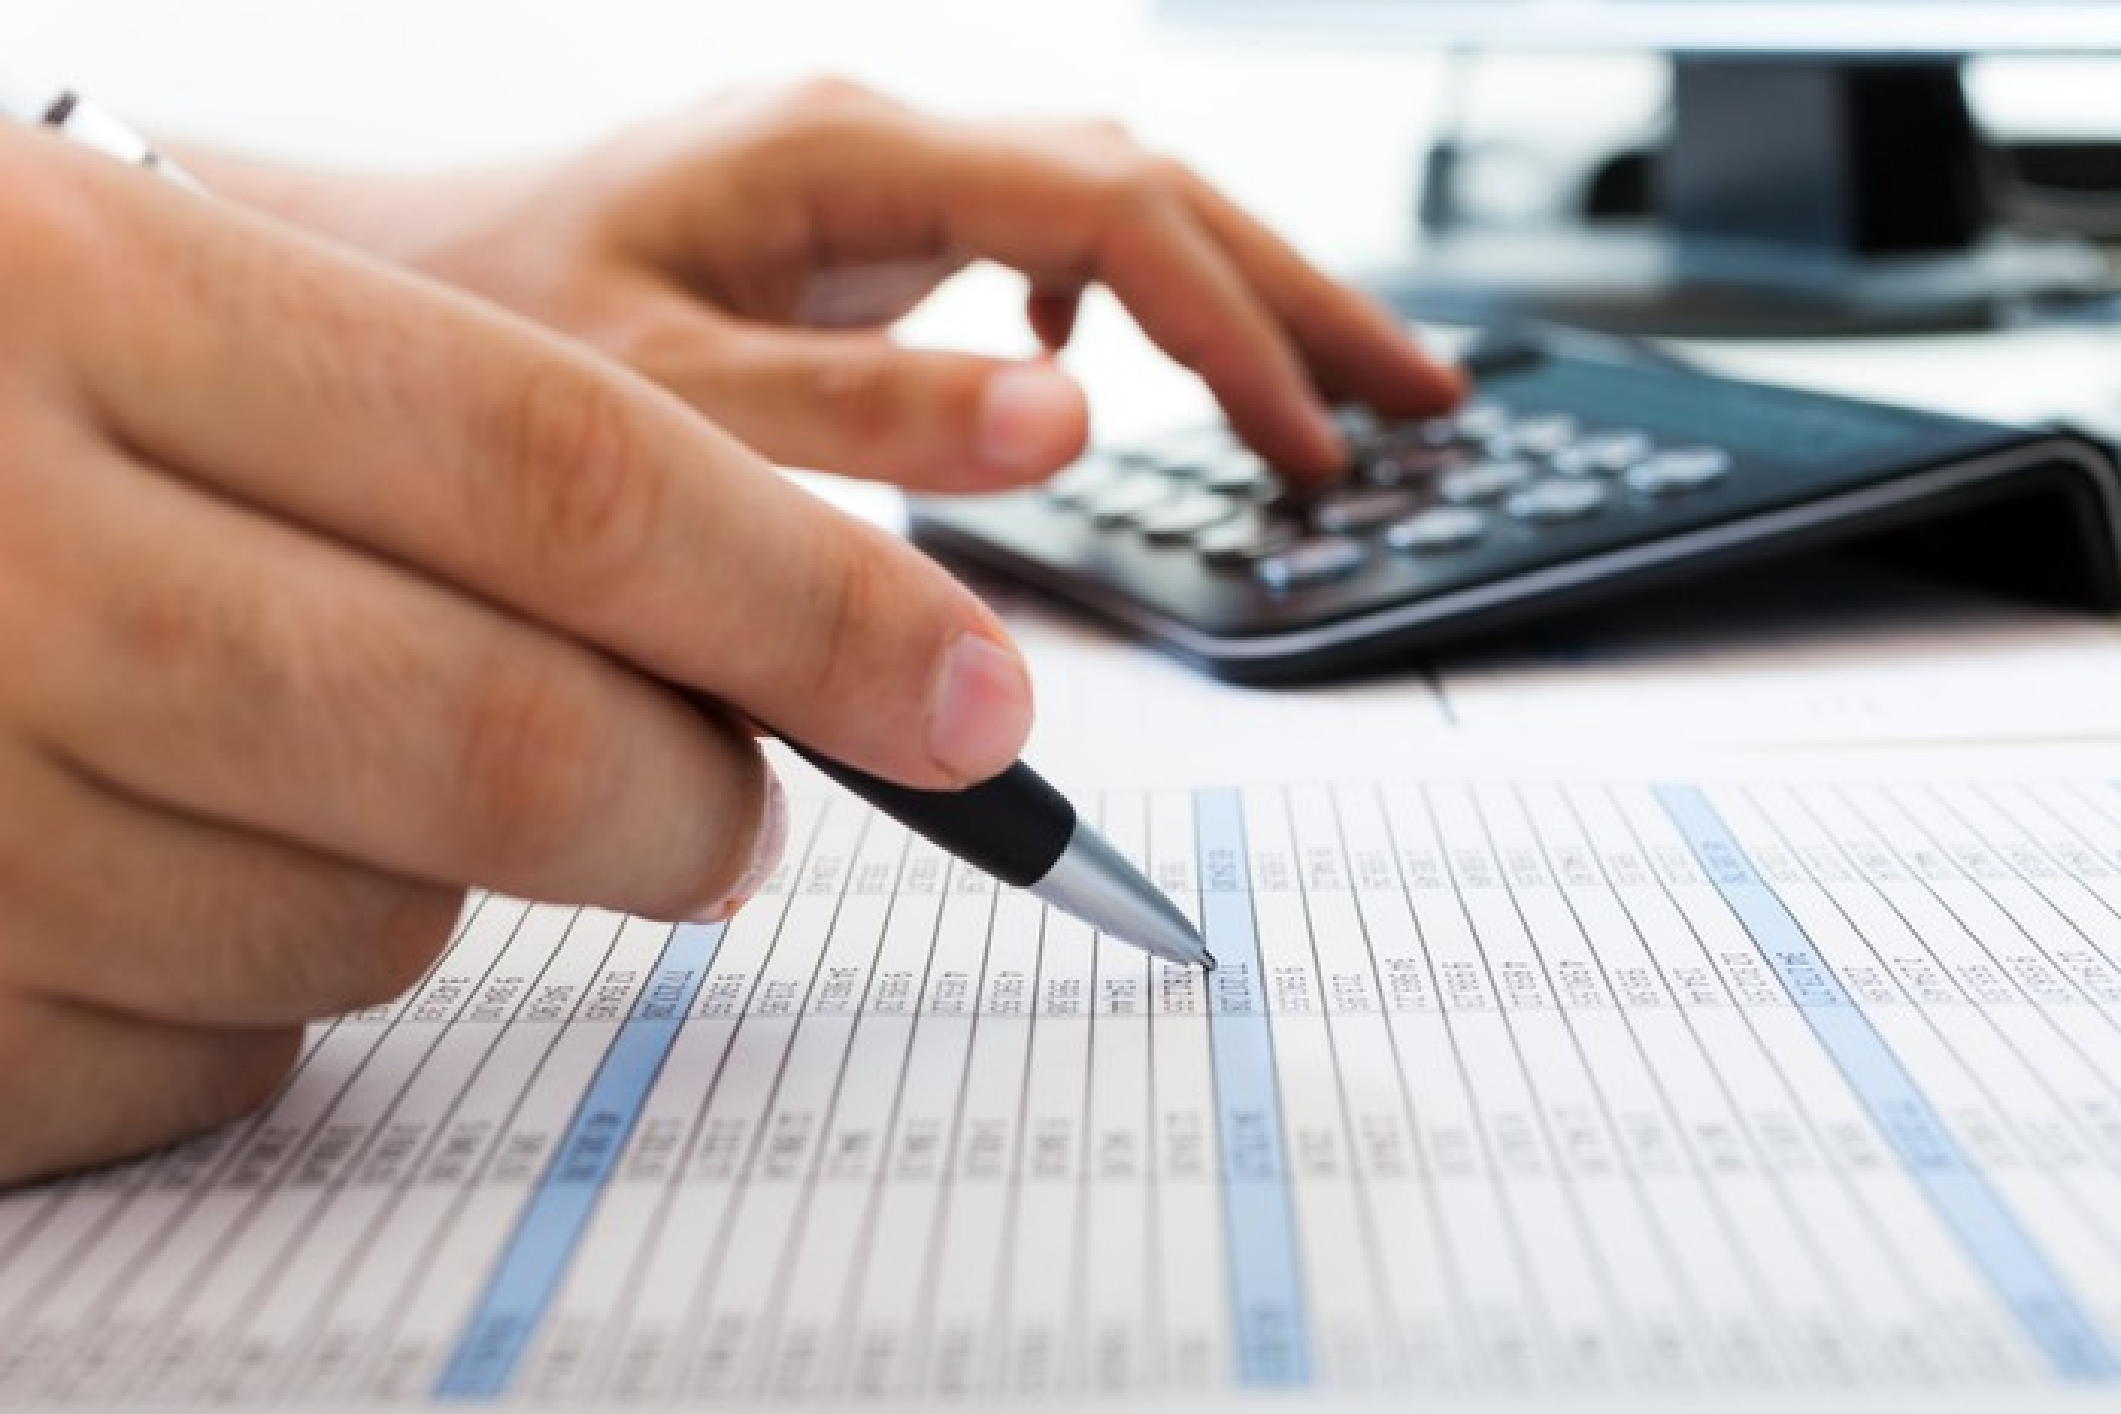 An accountant using a calculator and examining a balance sheet.